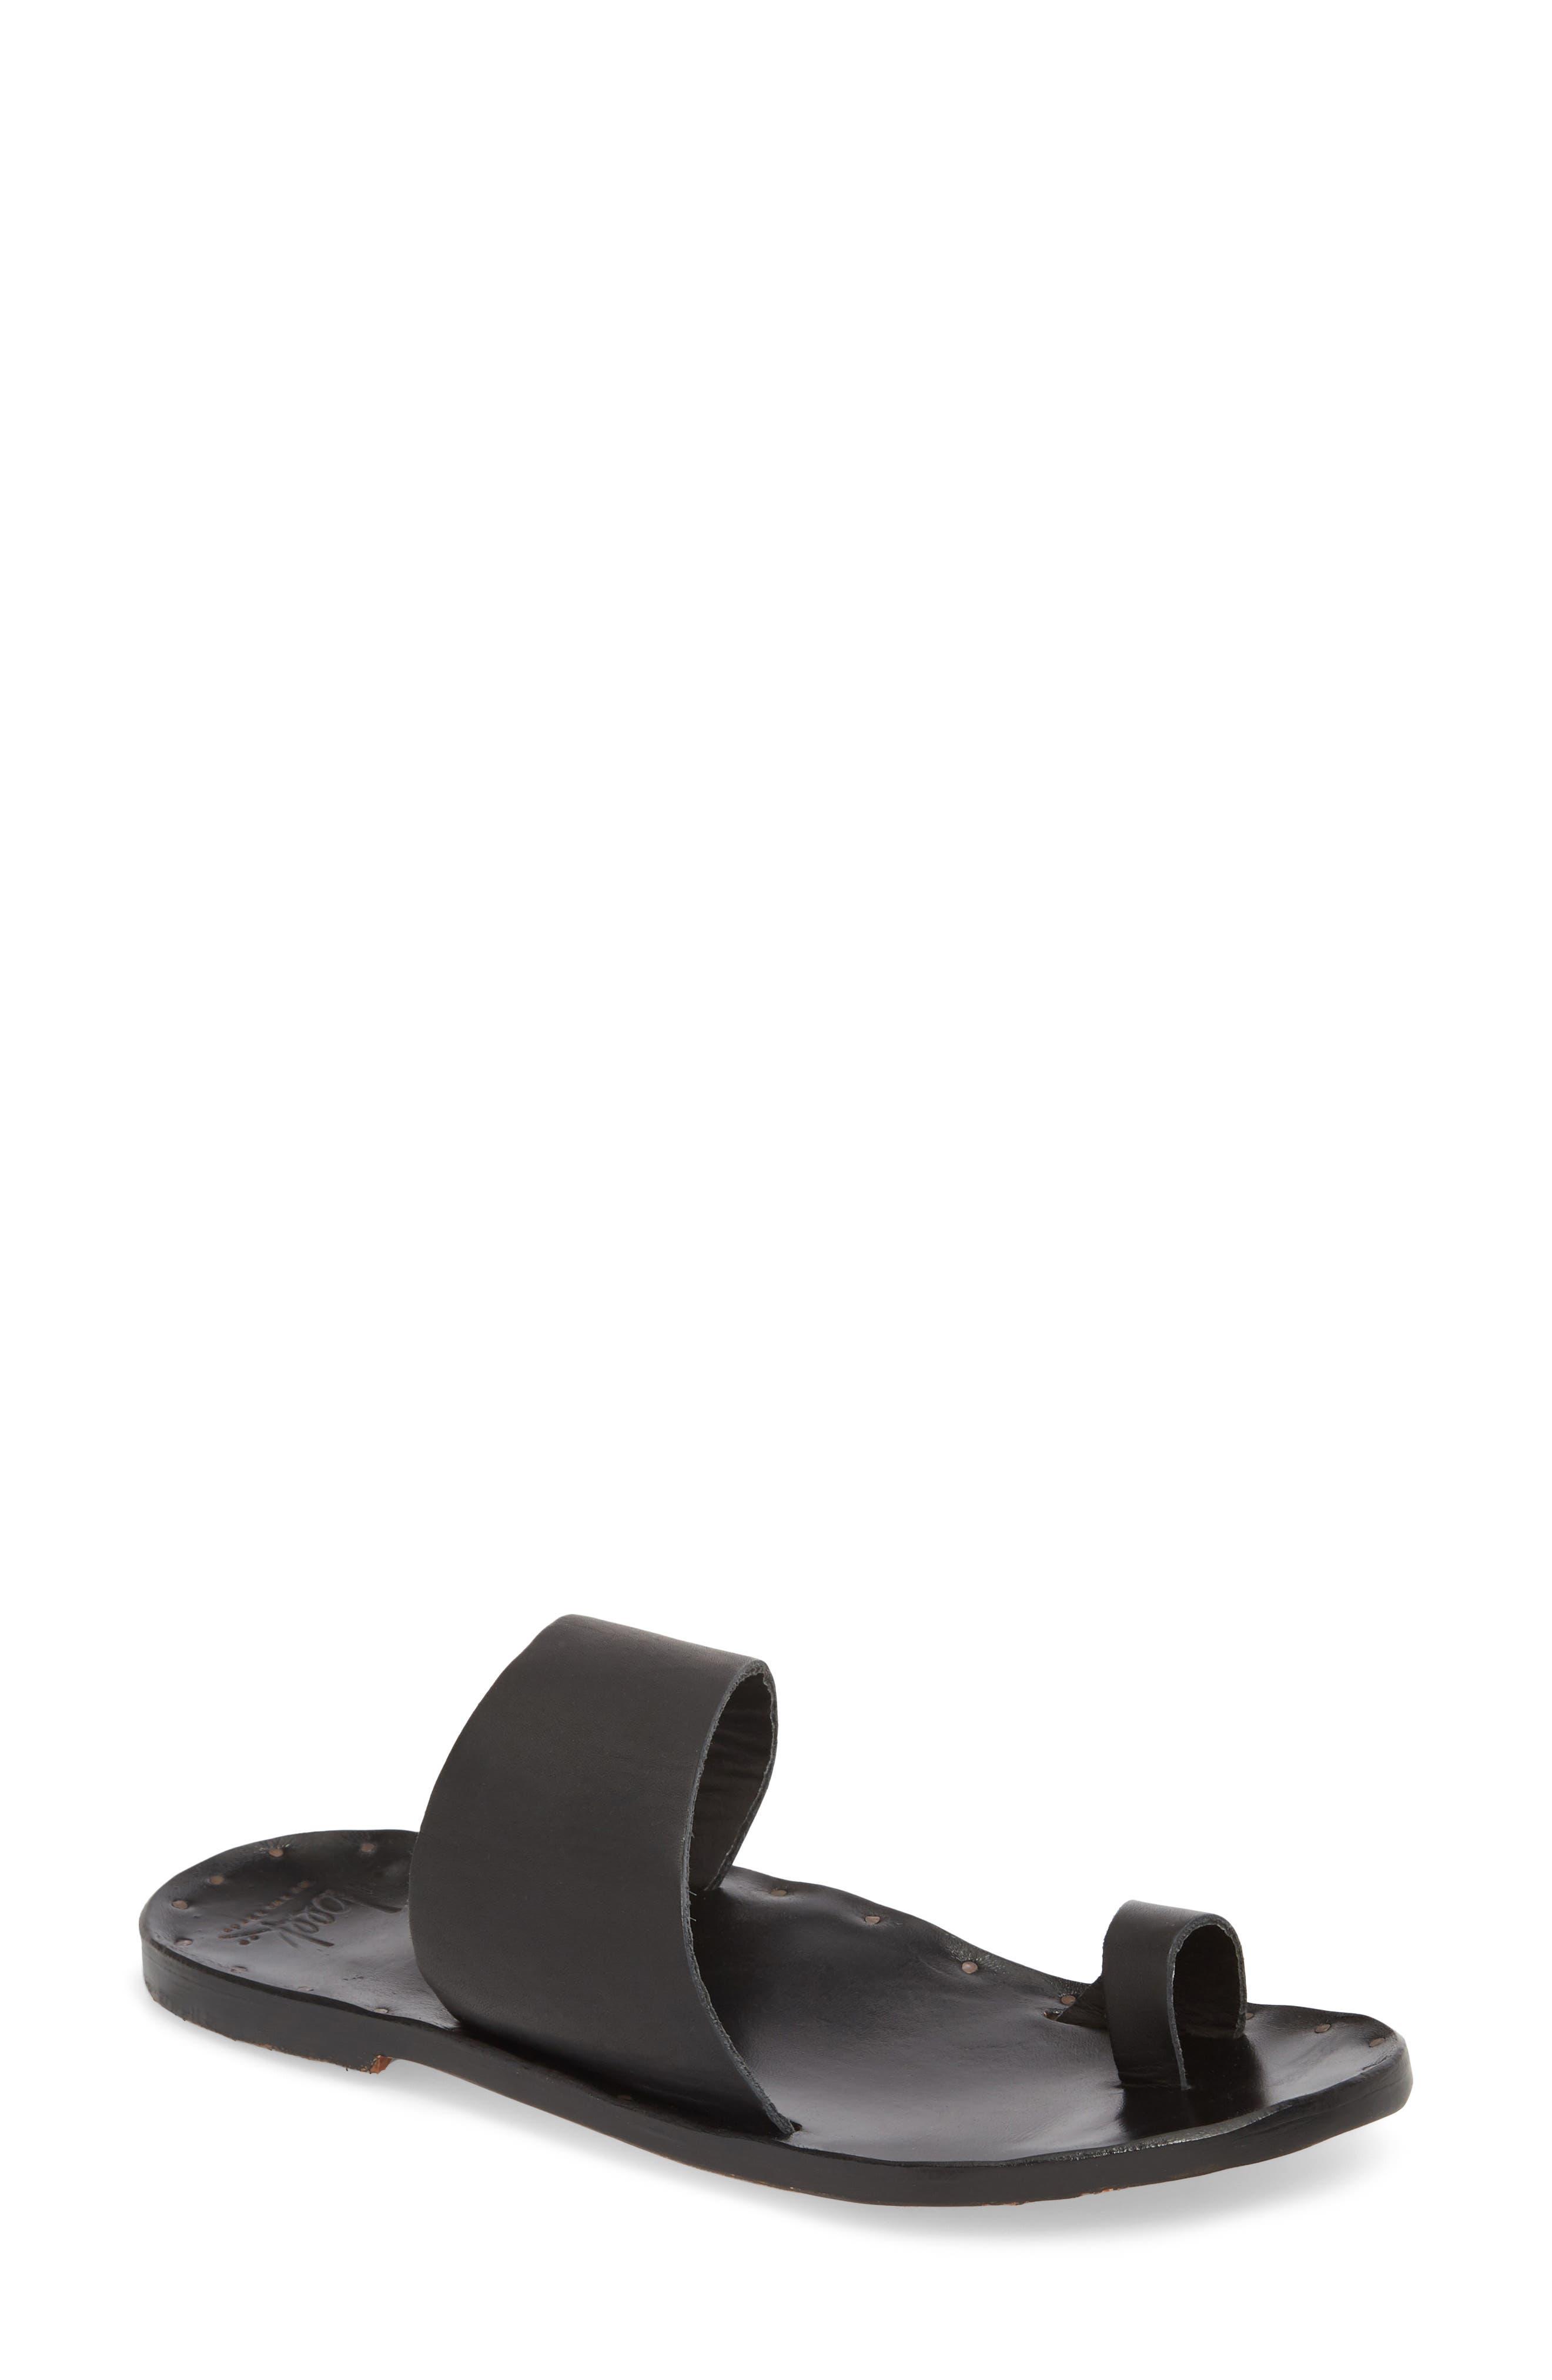 Finch Sandal,                             Main thumbnail 1, color,                             BLACK/ BLACK